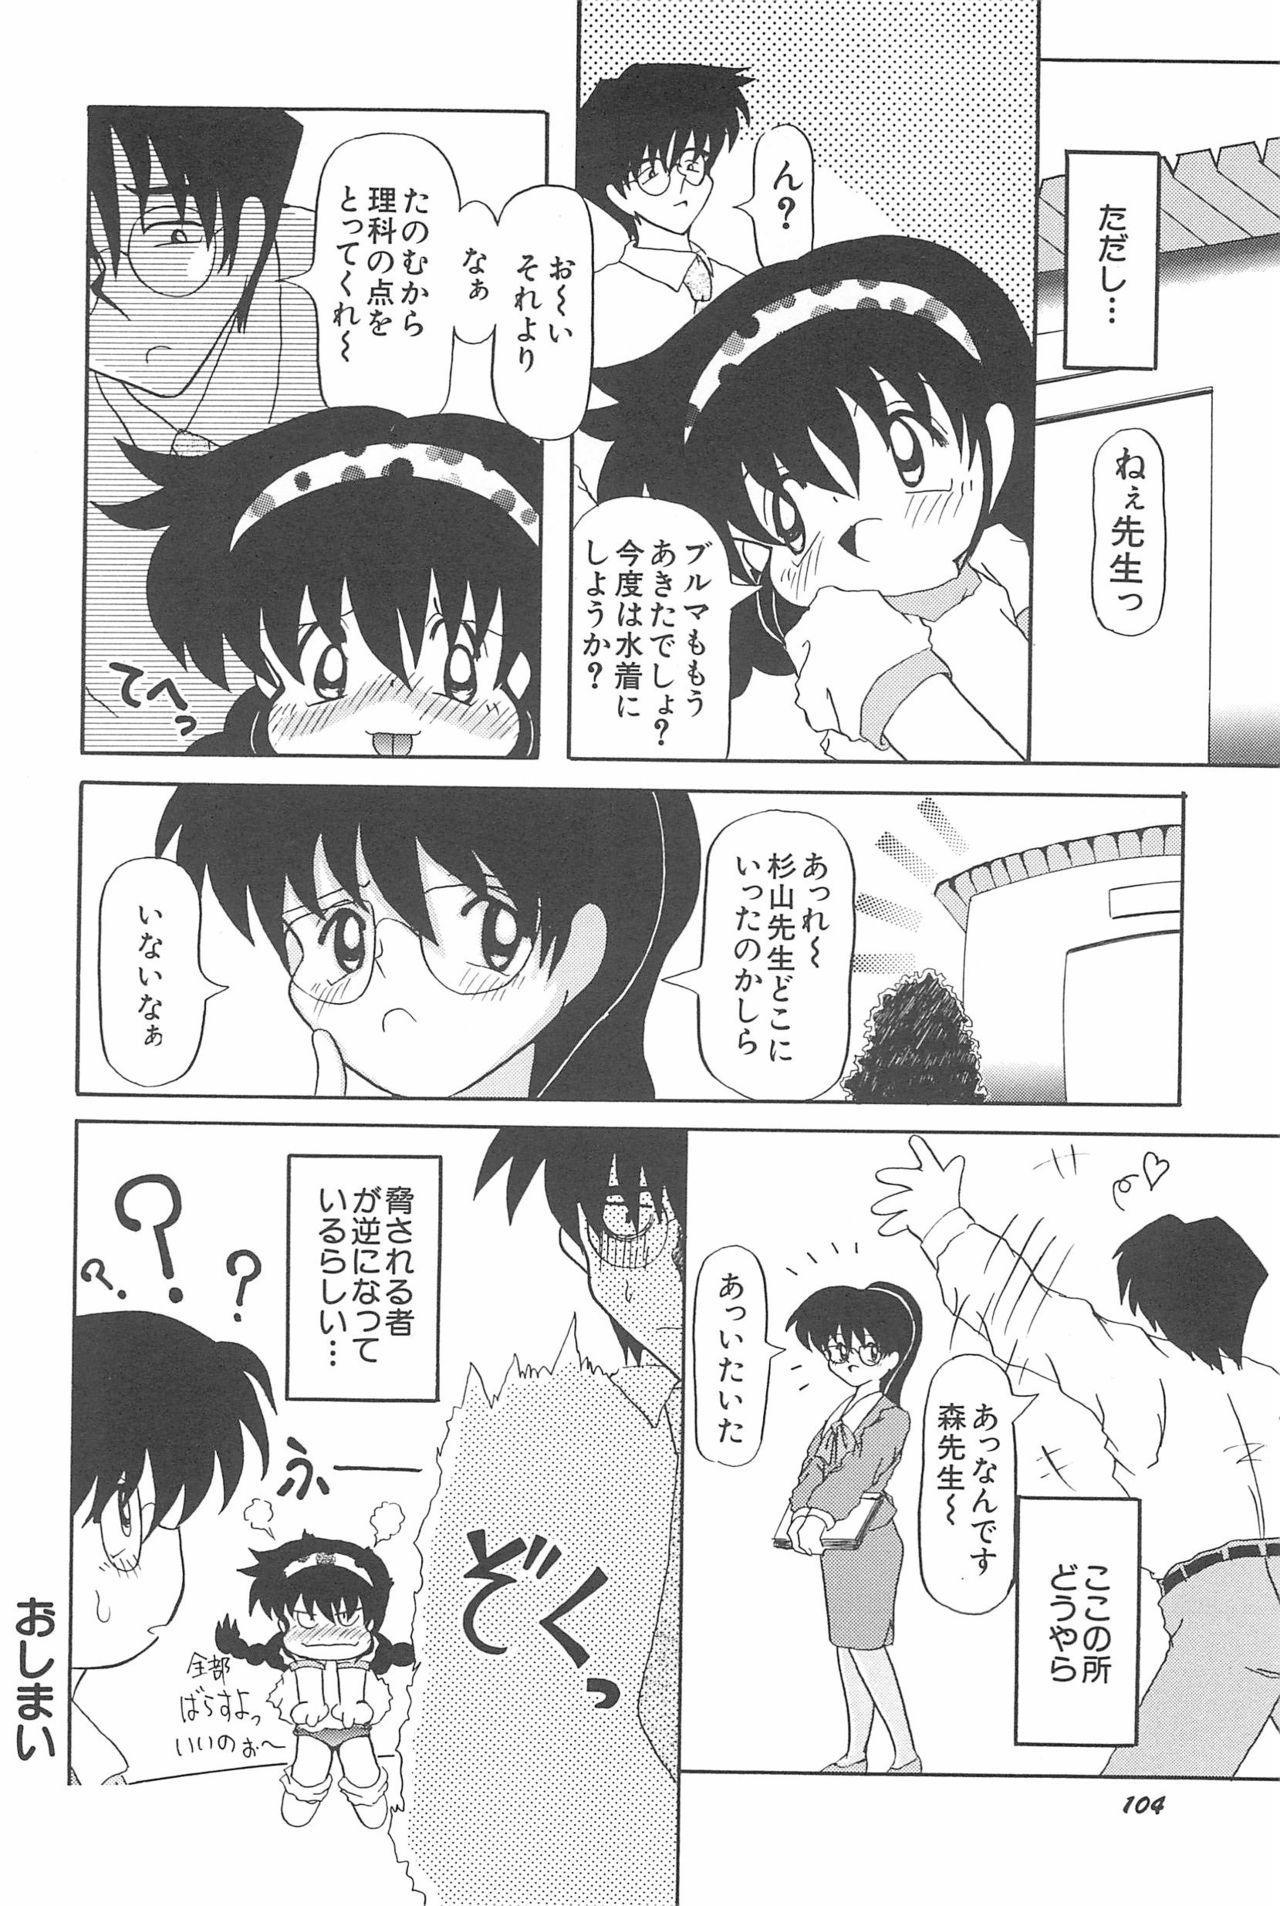 Aoi Shojokyuu 109